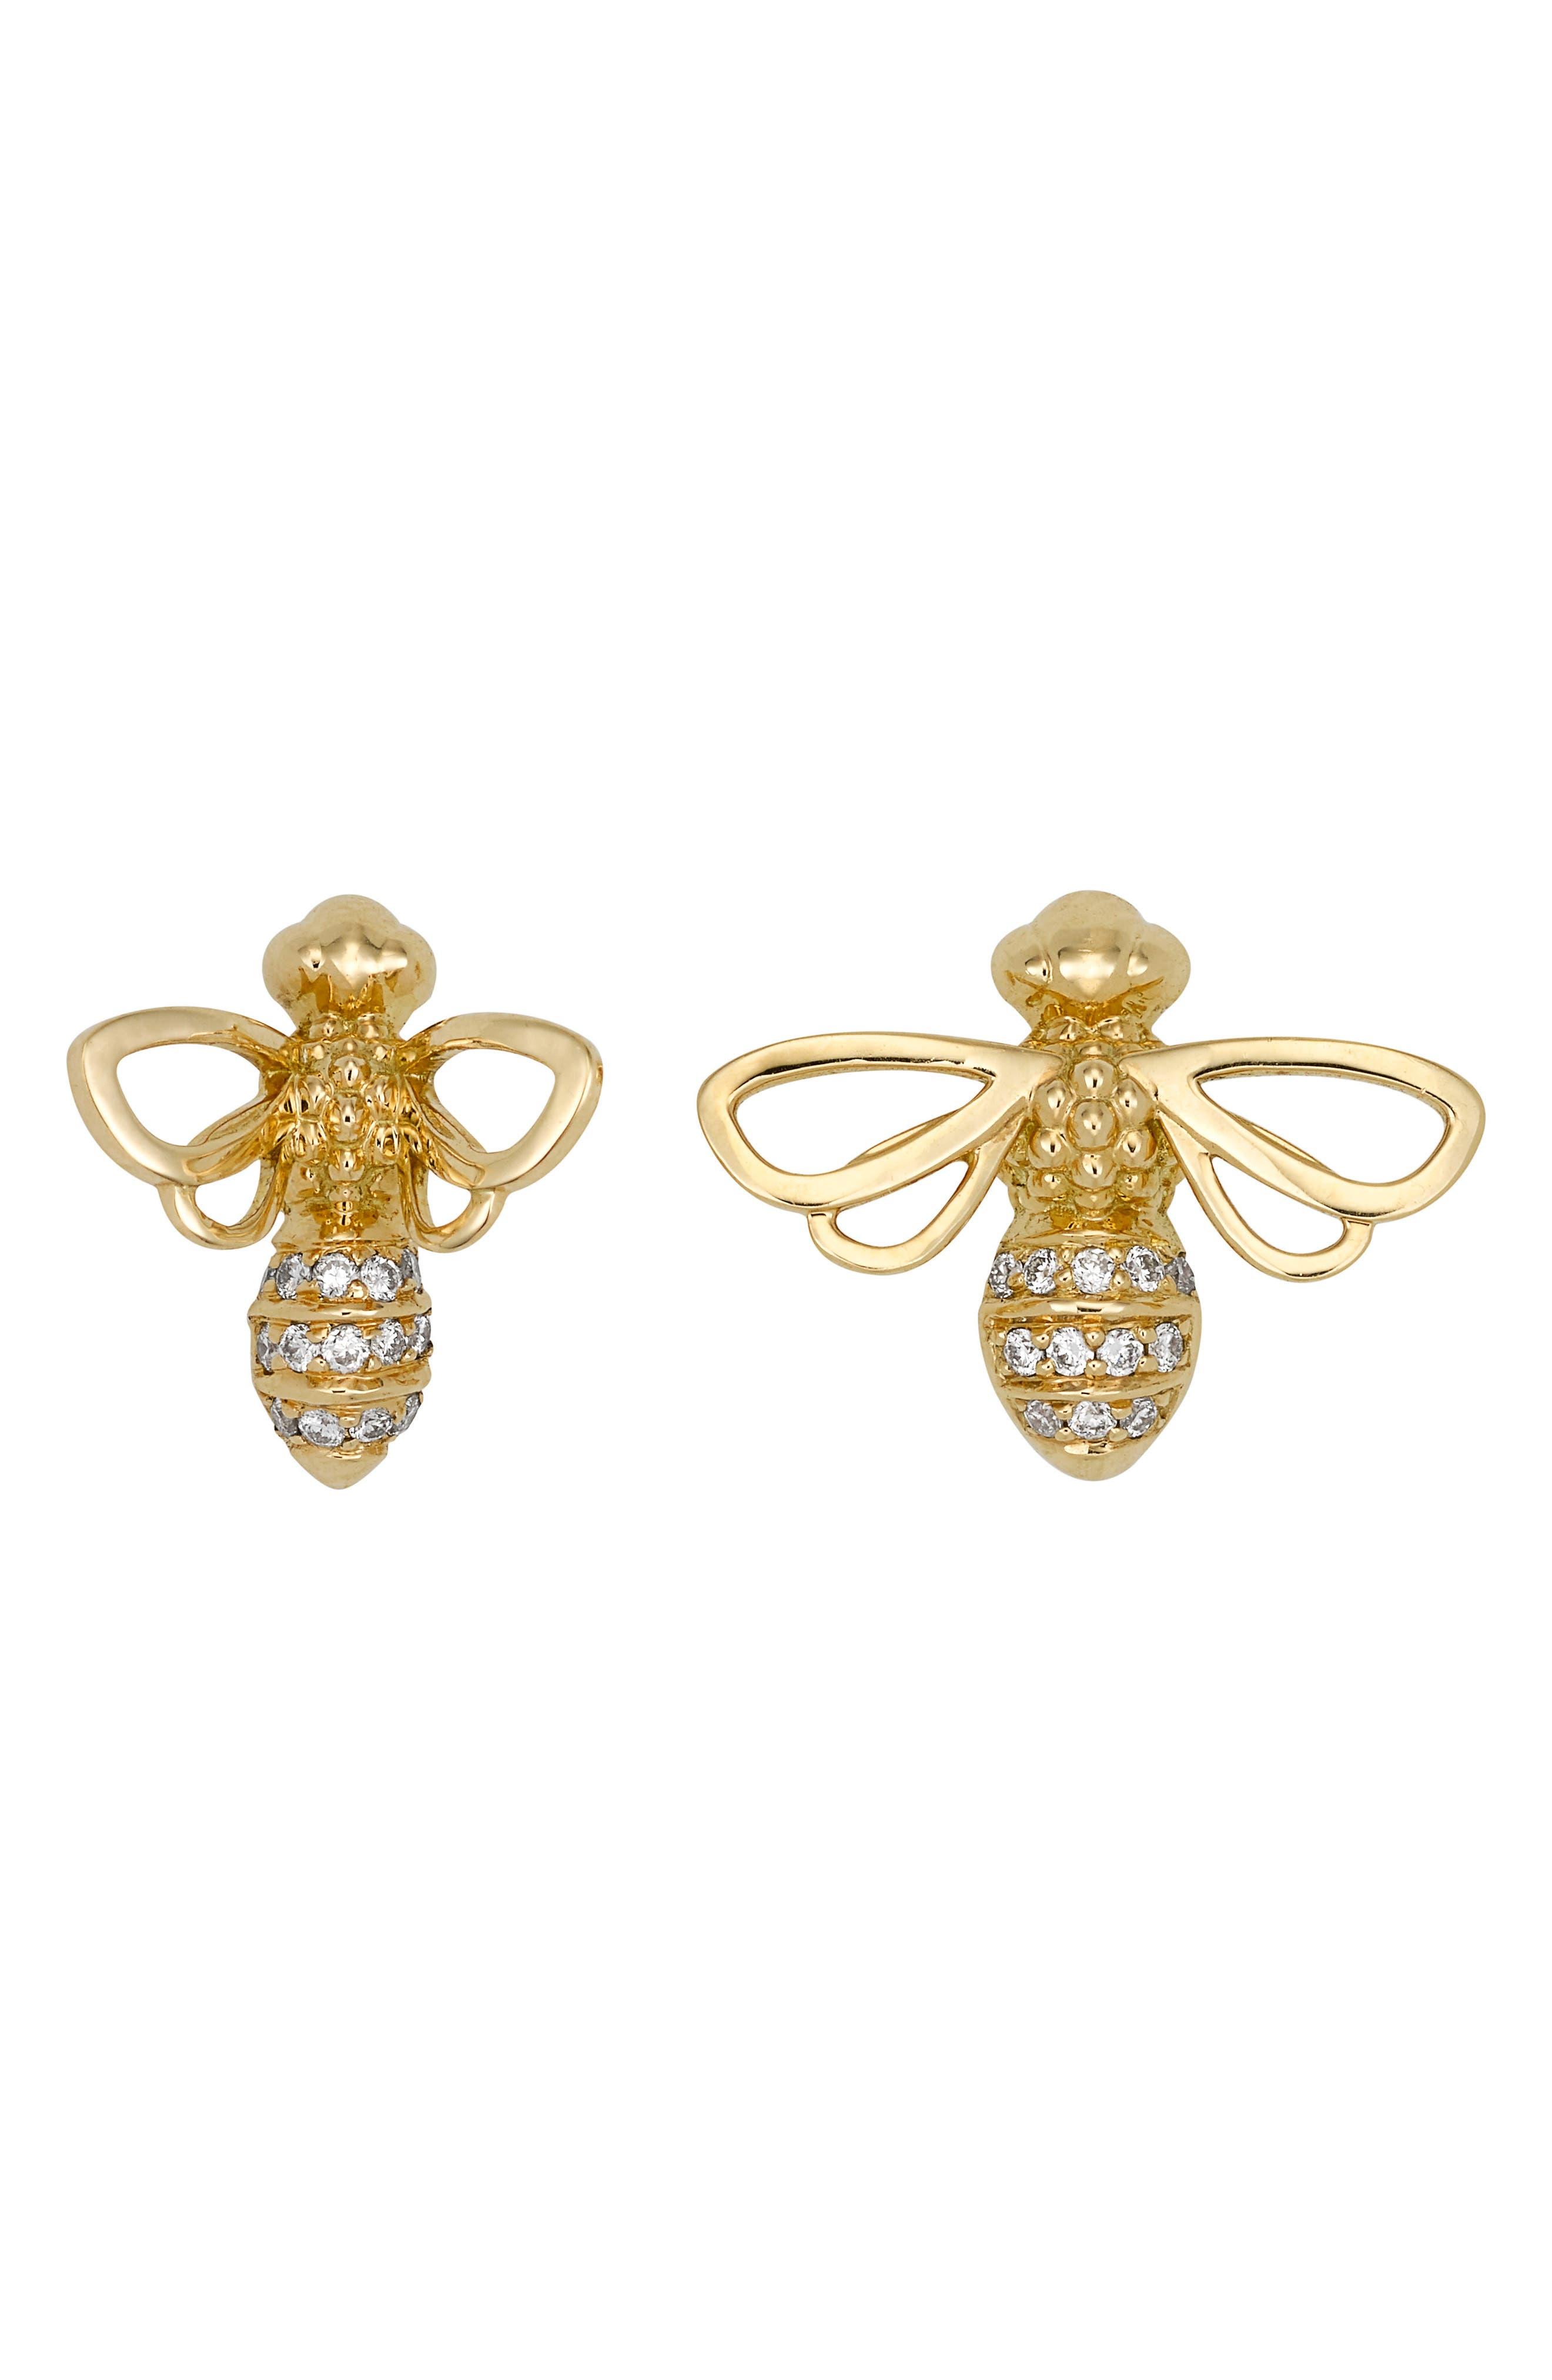 18K Gold & Diamond Bee Stud Earrings,                         Main,                         color, YELLOW GOLD